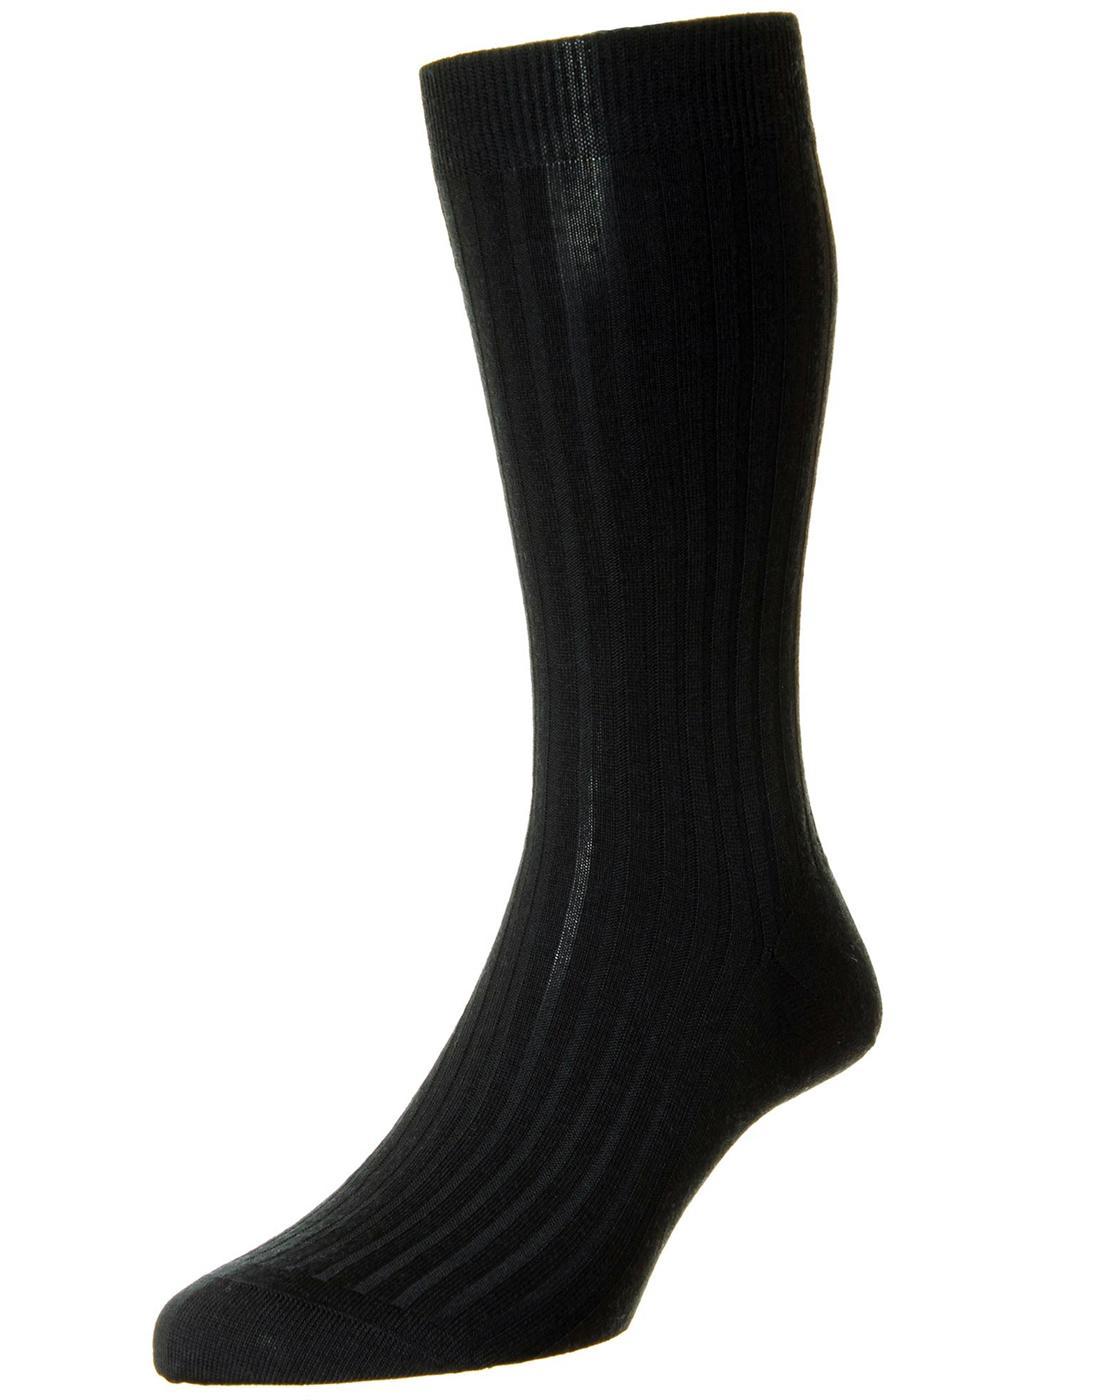 + PANTHERELLA Retro Mod Plain Knit Ribbed Socks B